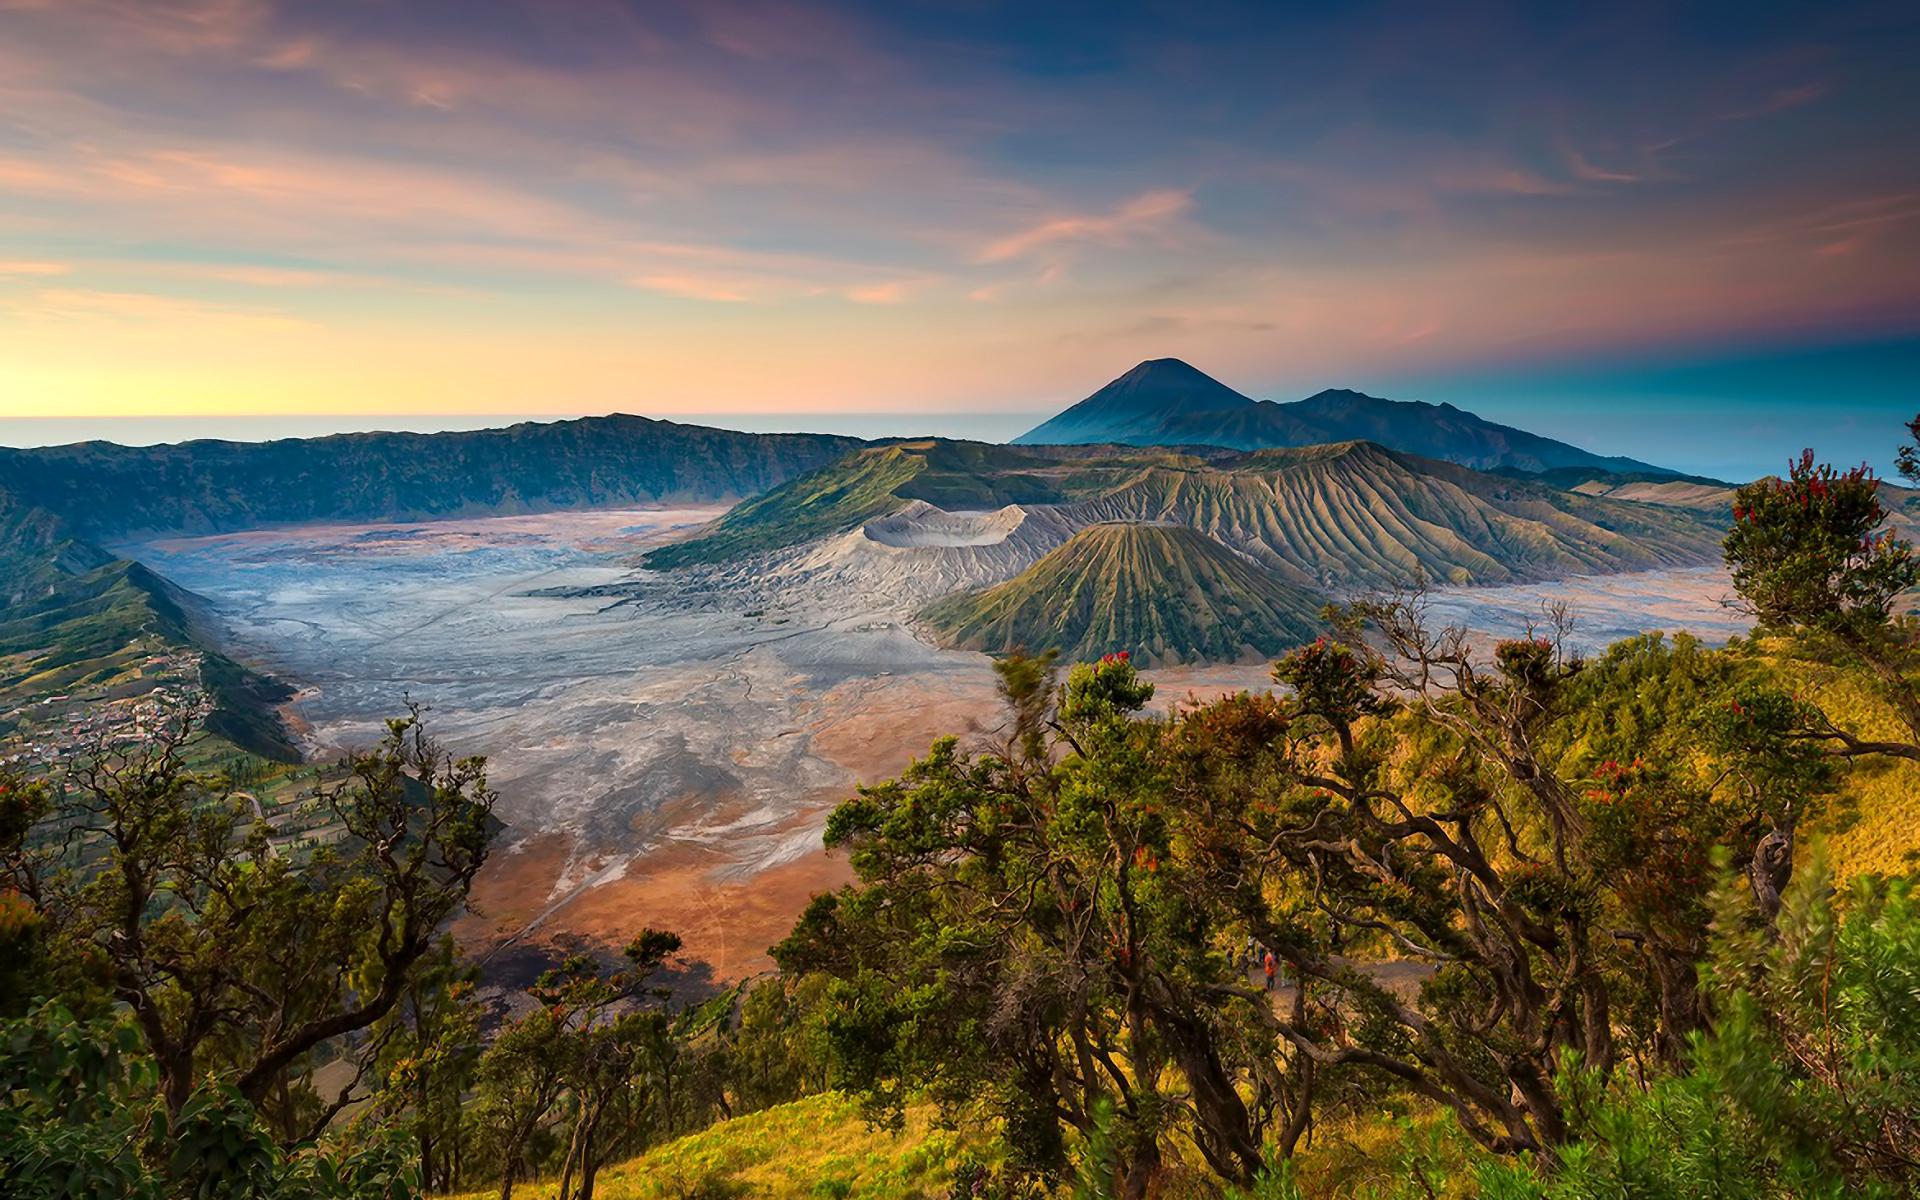 природа река деревь облака Индонезия  № 1670672 без смс